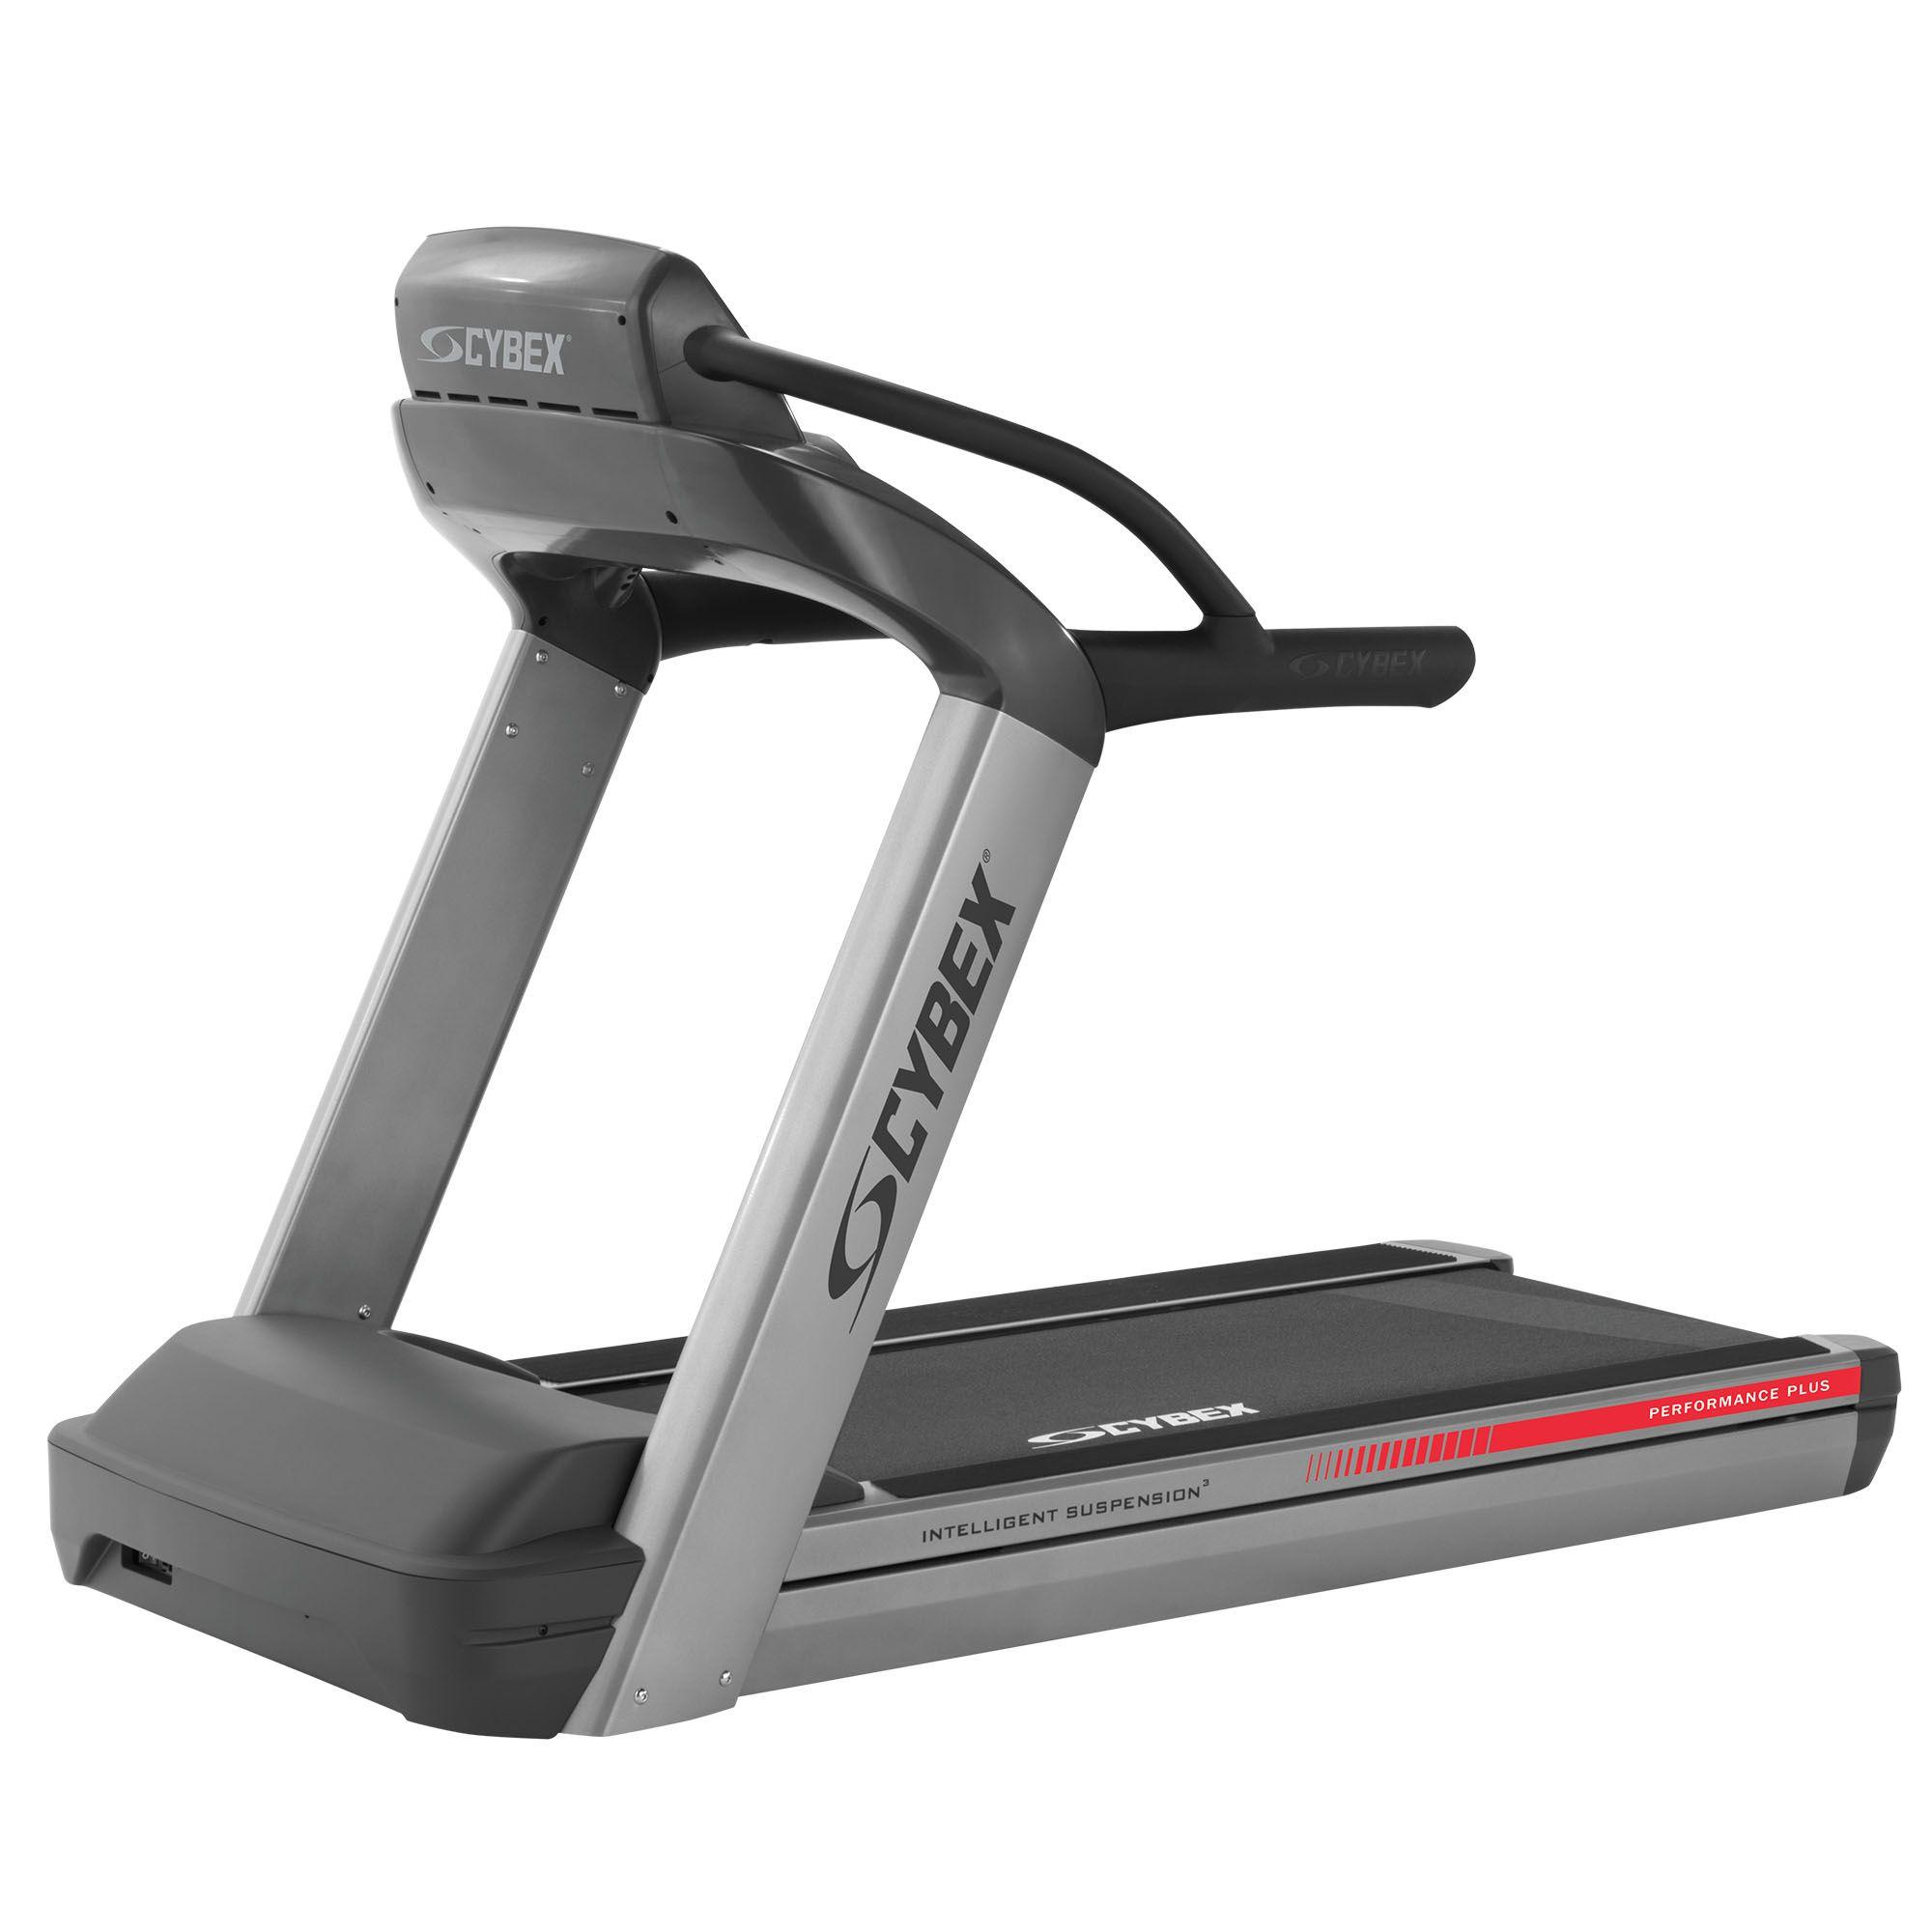 Cybex Treadmill Heart Rate Monitor